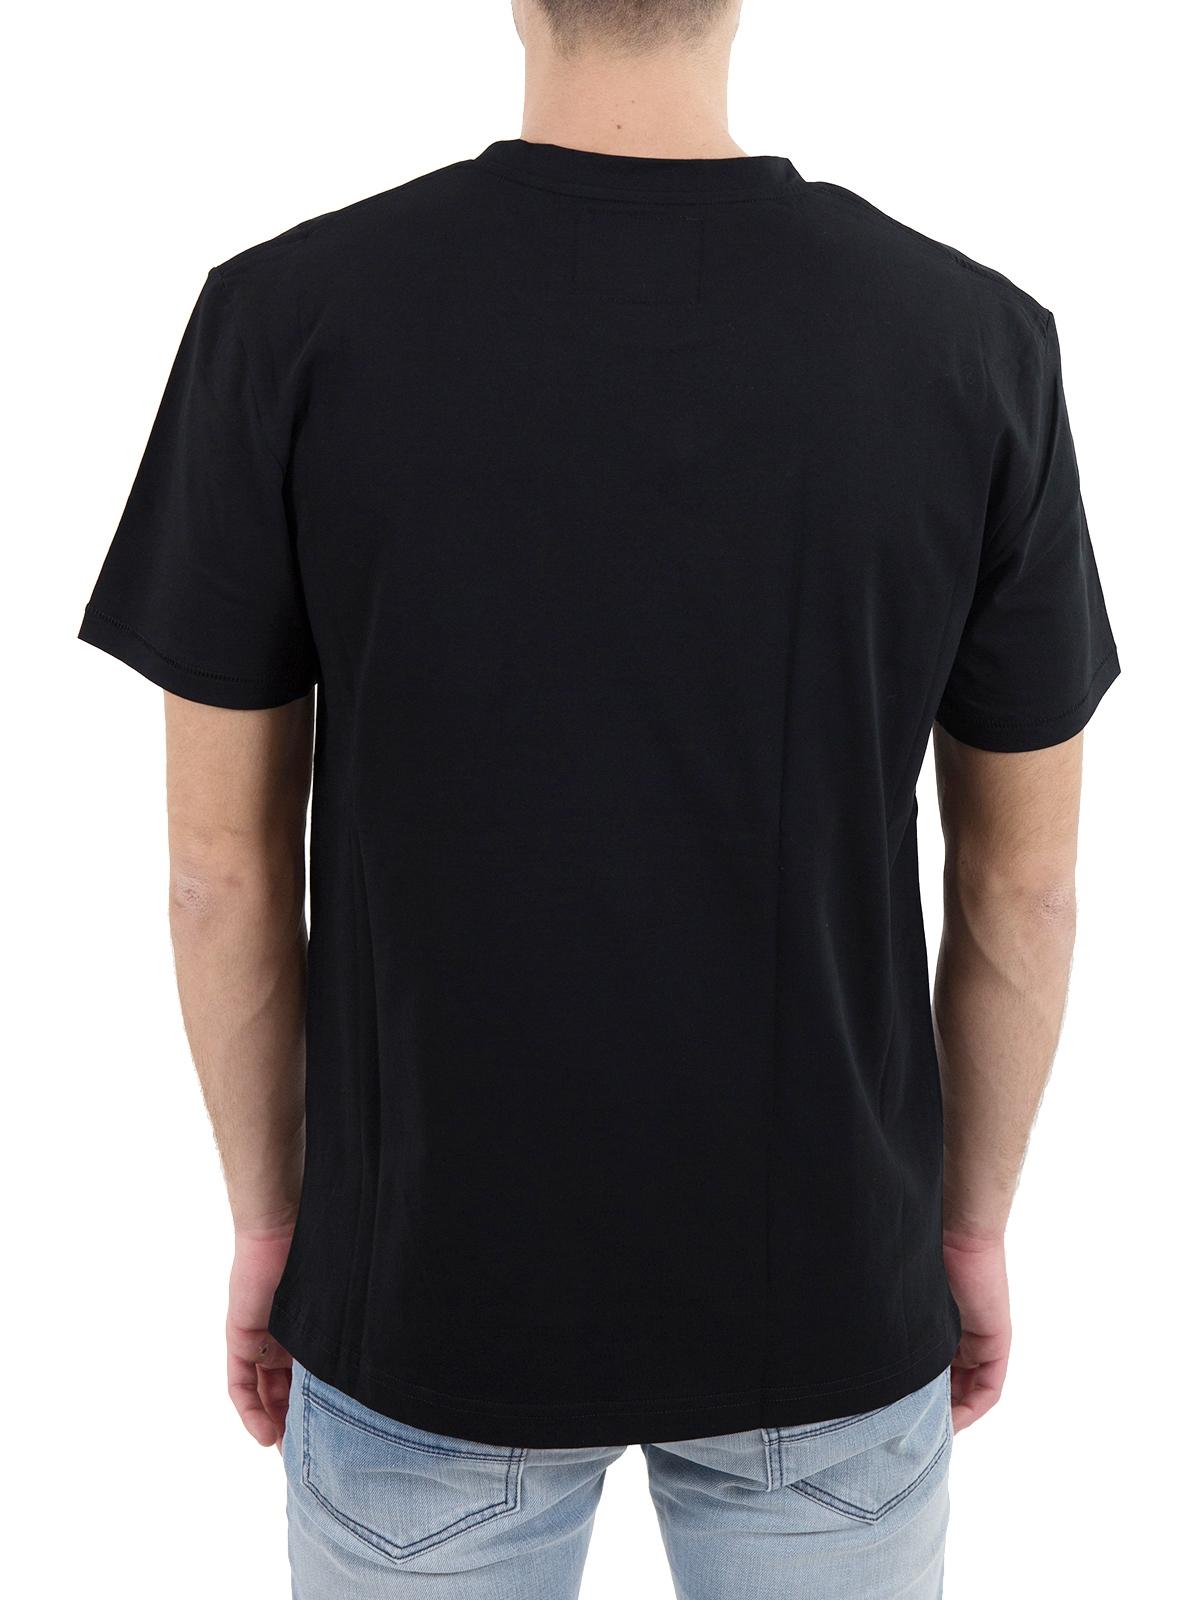 Lords & Fools T-shirt S19 T-SHIRT LF